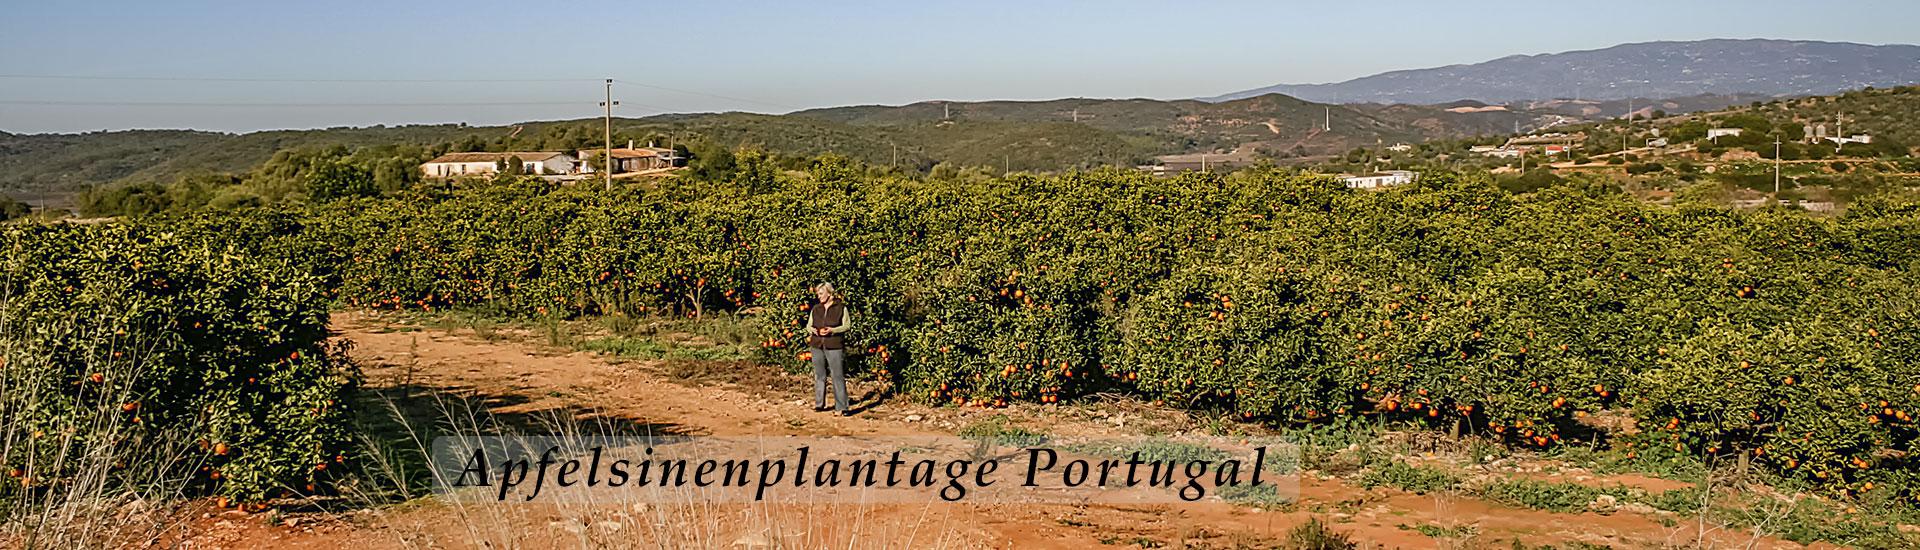 Apfelsinenplantage